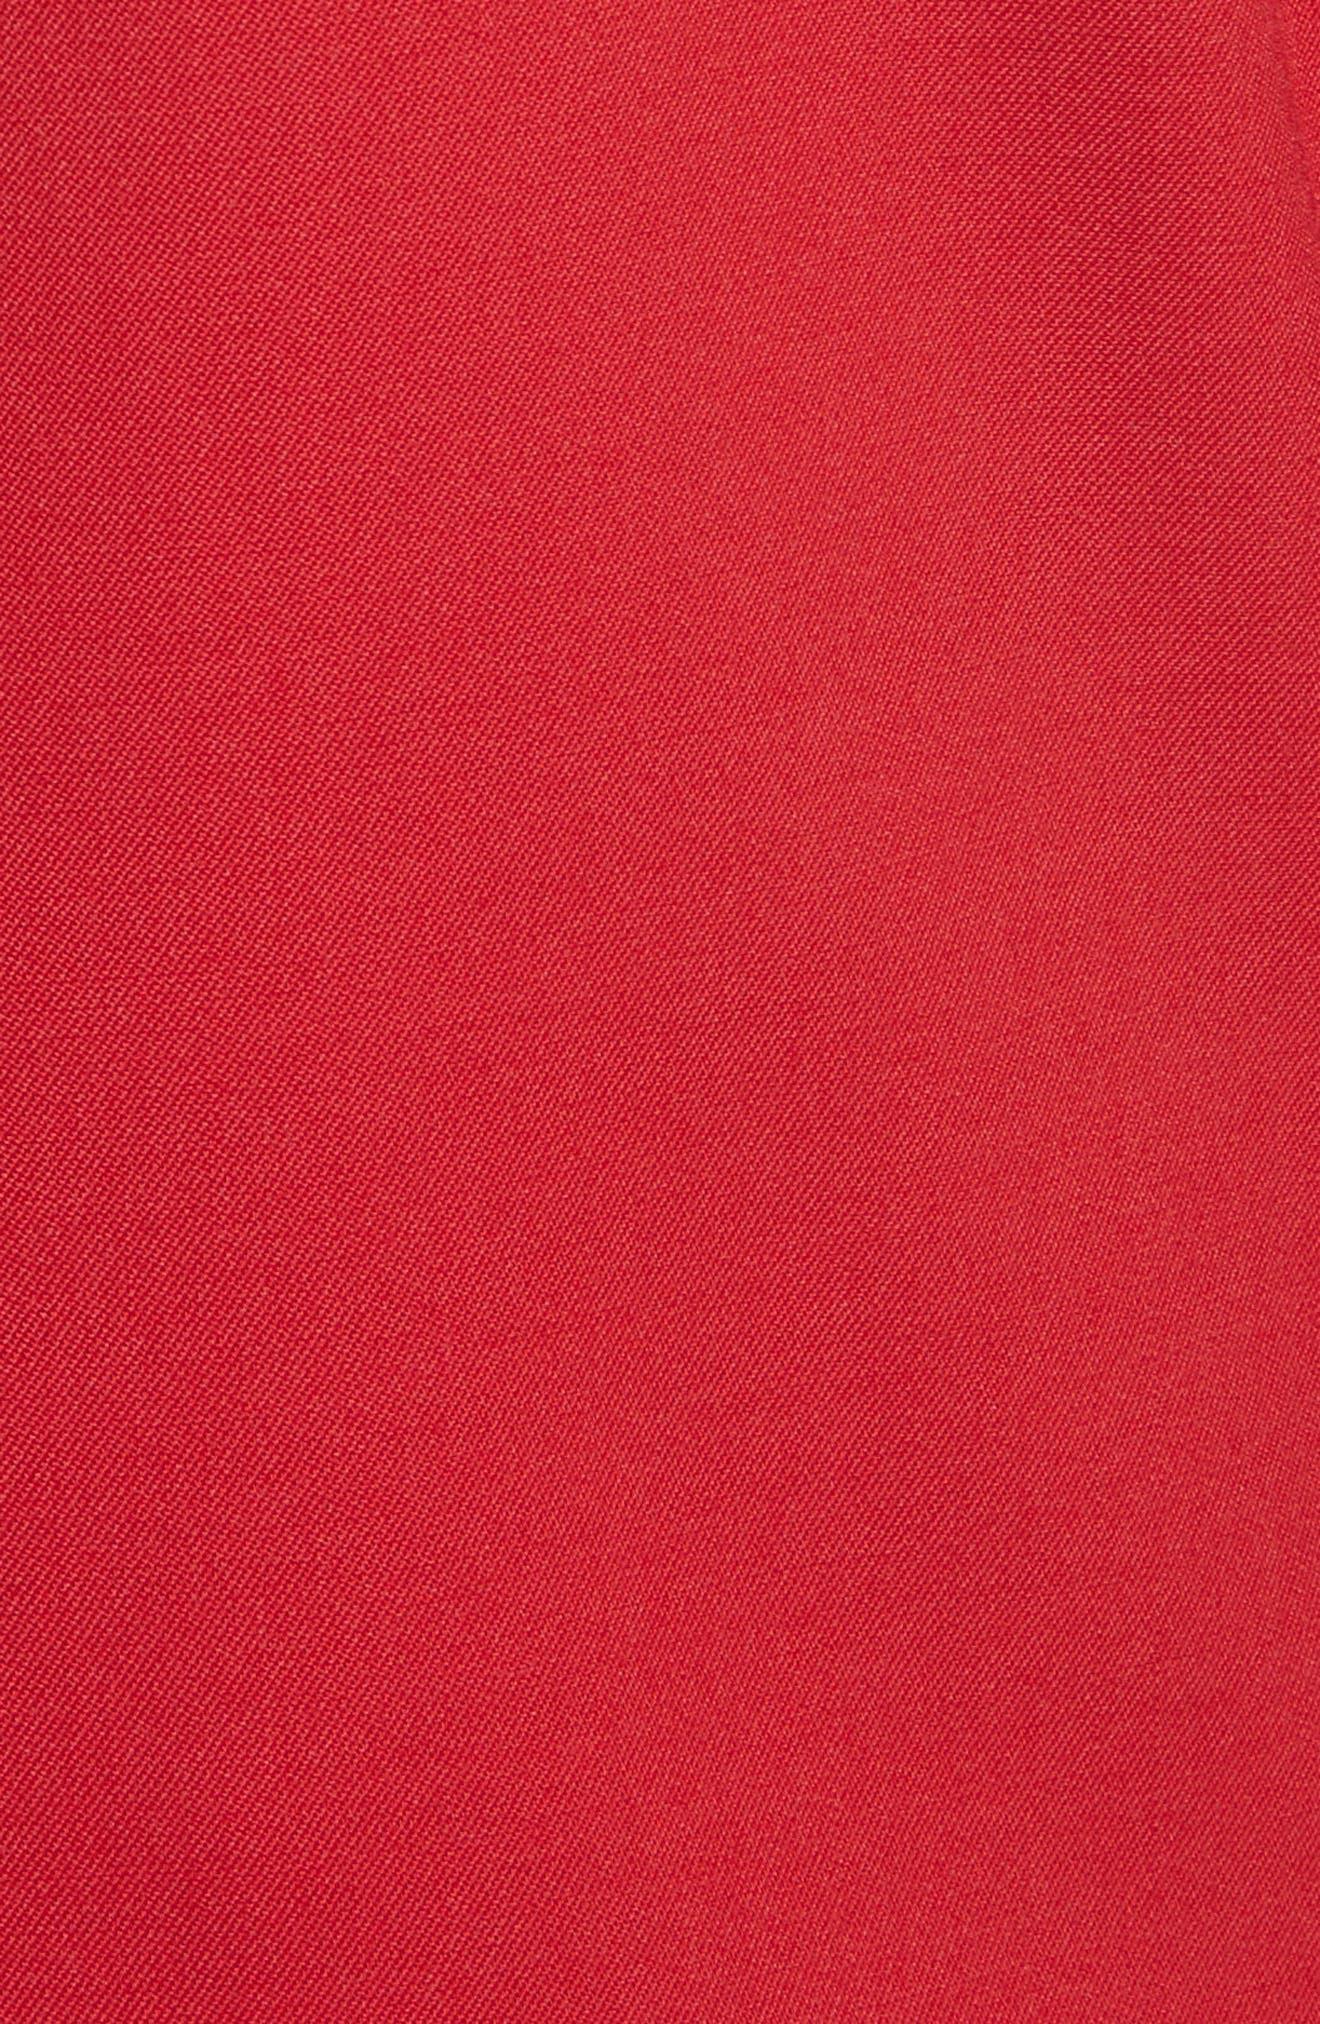 Stretch Wool Boyfriend Blazer,                             Alternate thumbnail 6, color,                             641